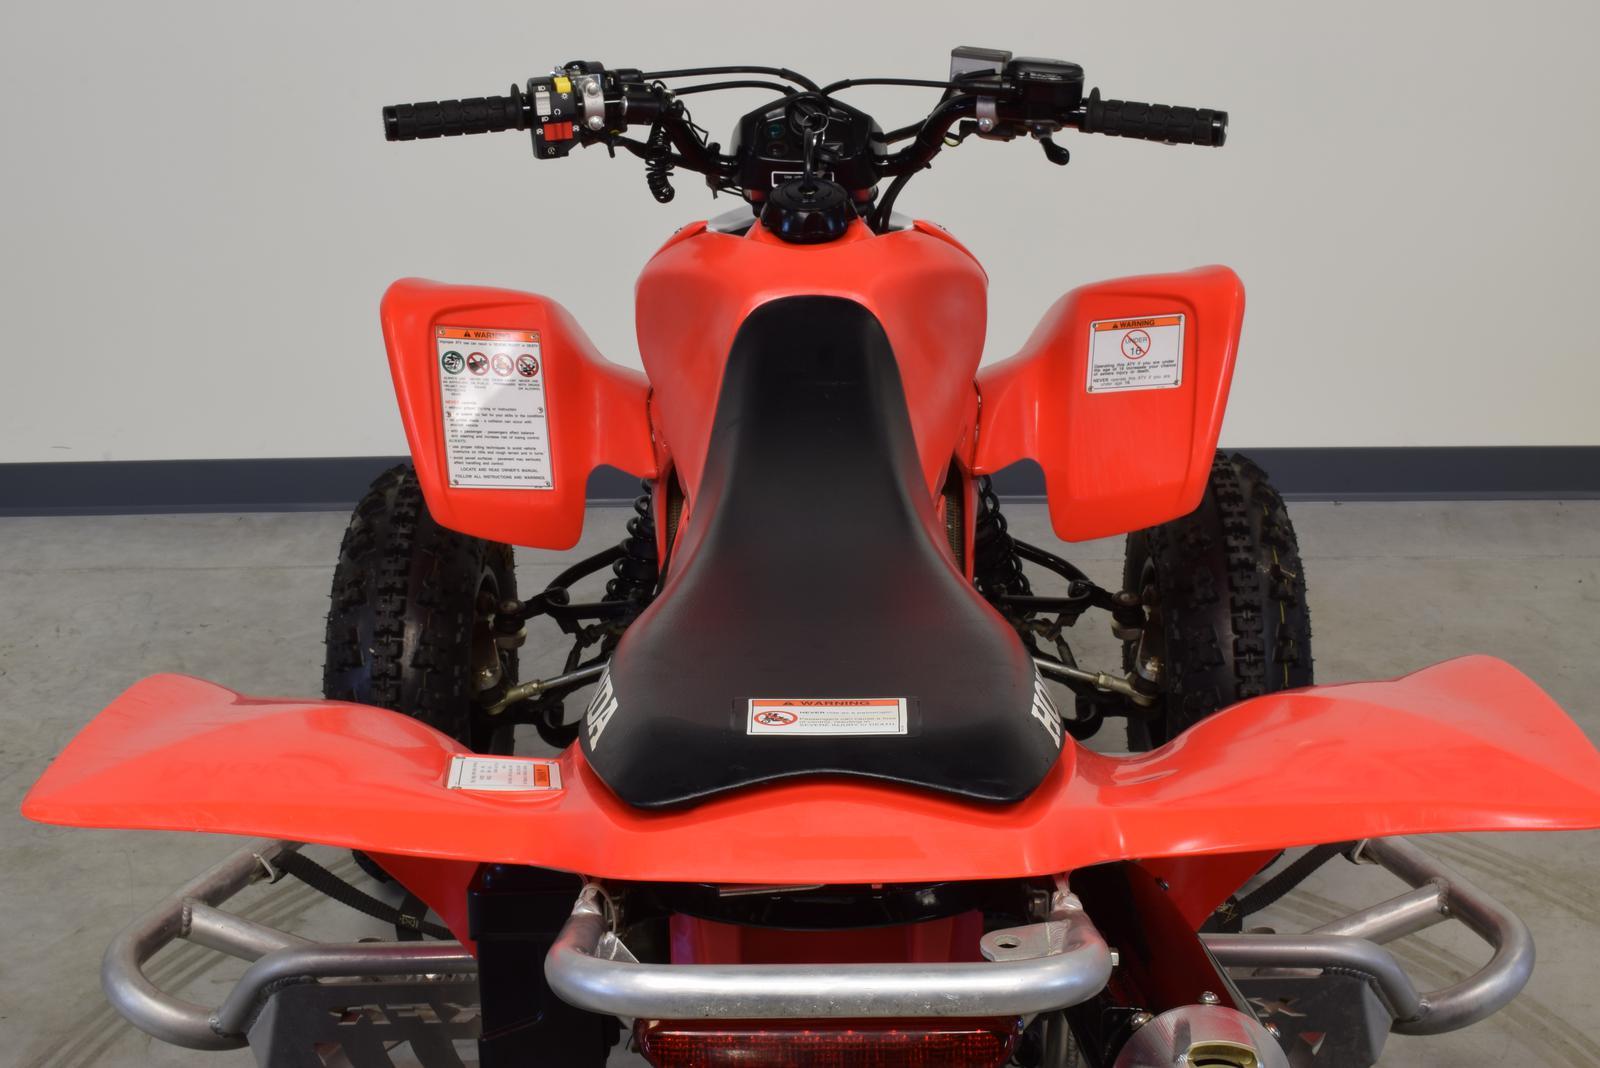 Trx450r Top Speed